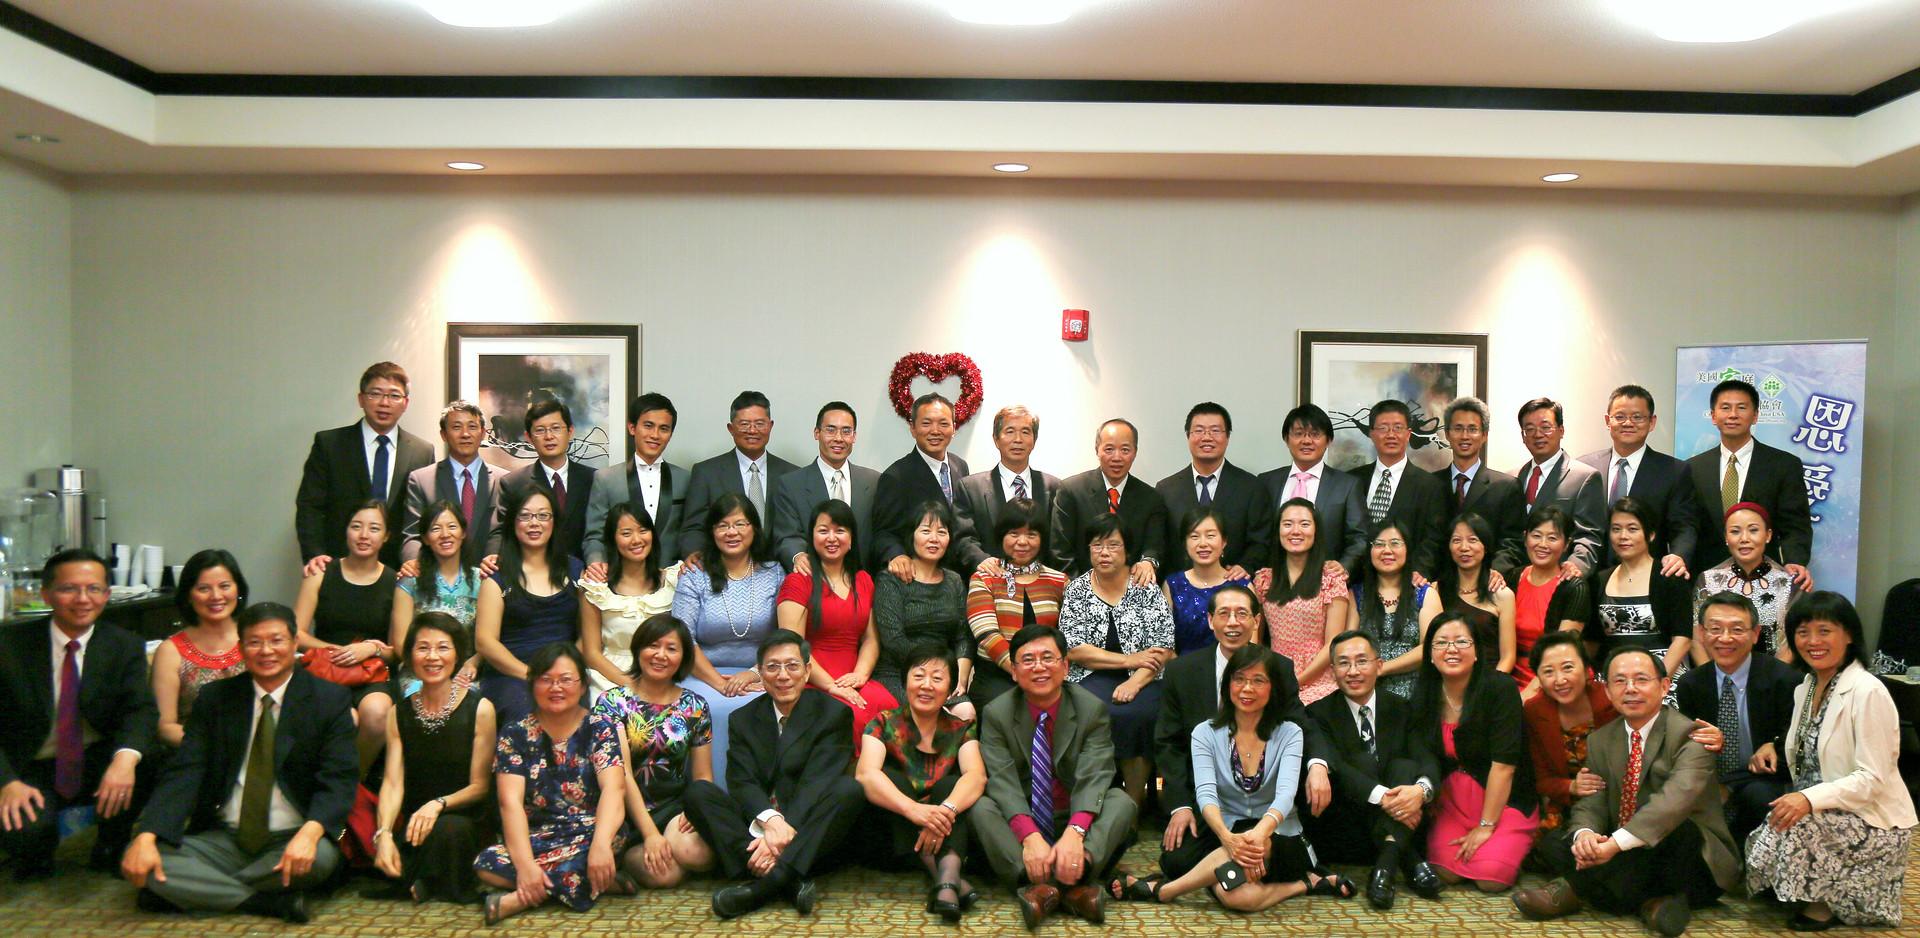 2015-sep-acc-mer-group-photo.jpg